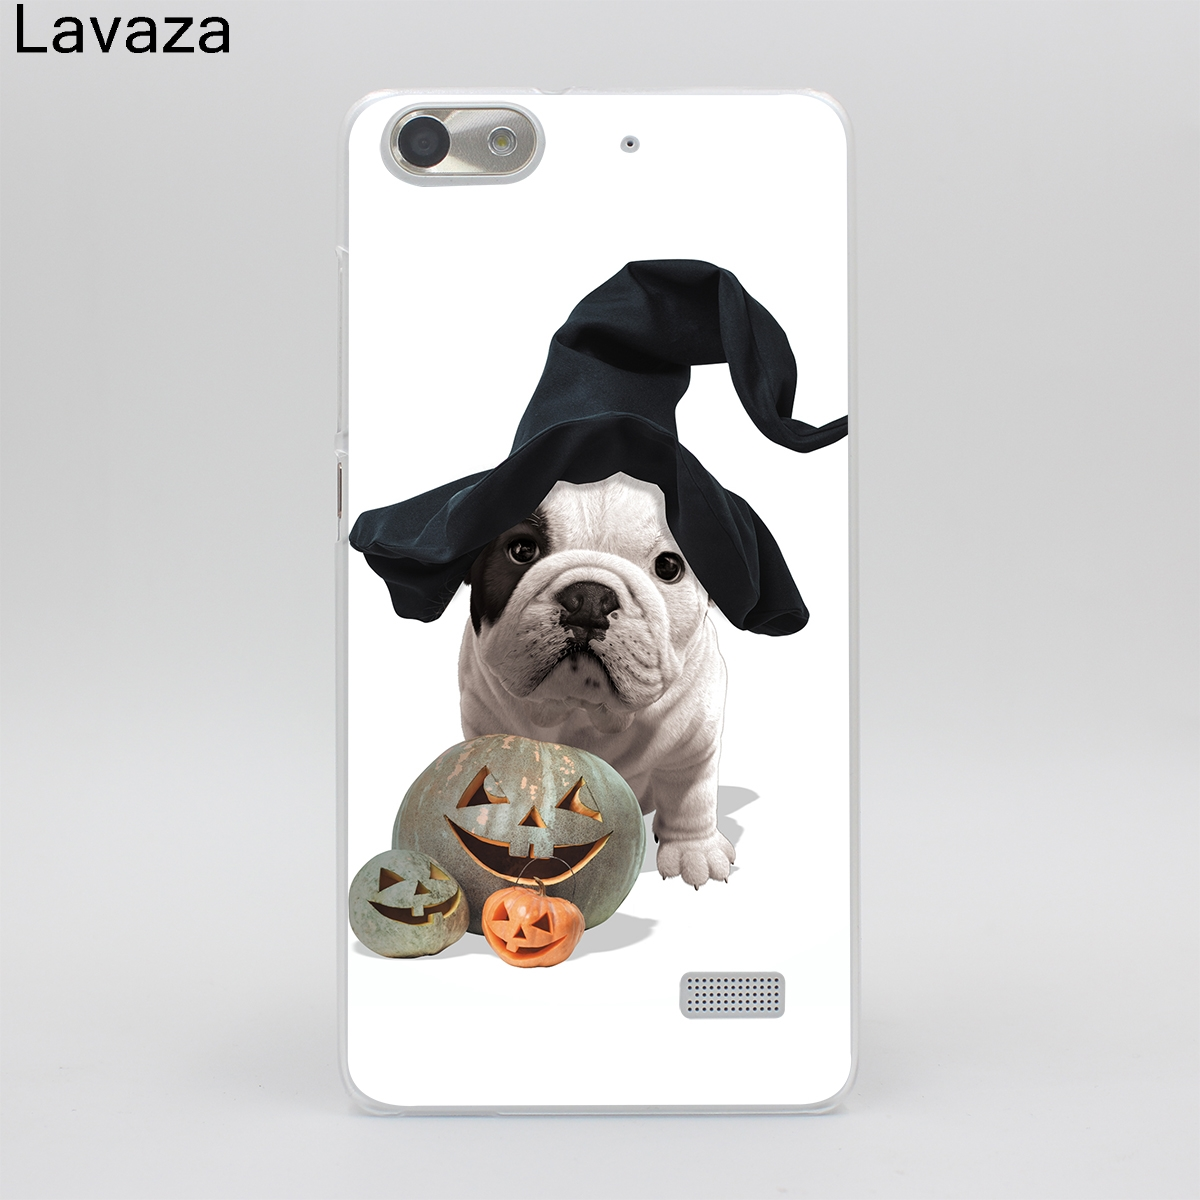 Lavaza French Bulldog Hard Case for Huawei P6 P7 P8 P9 P10 Lite Plus Y3 Y5 Y6 Y7 P8 Lite P9 Lite 2017 G7